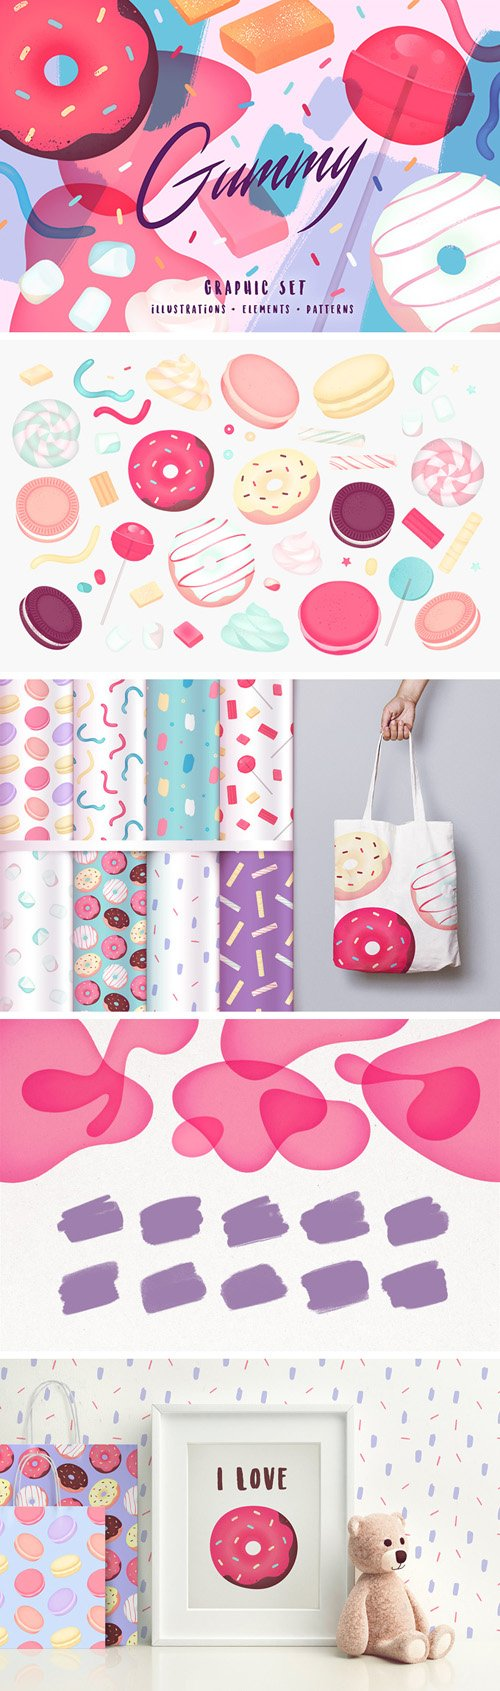 Gummy Graphic Sets